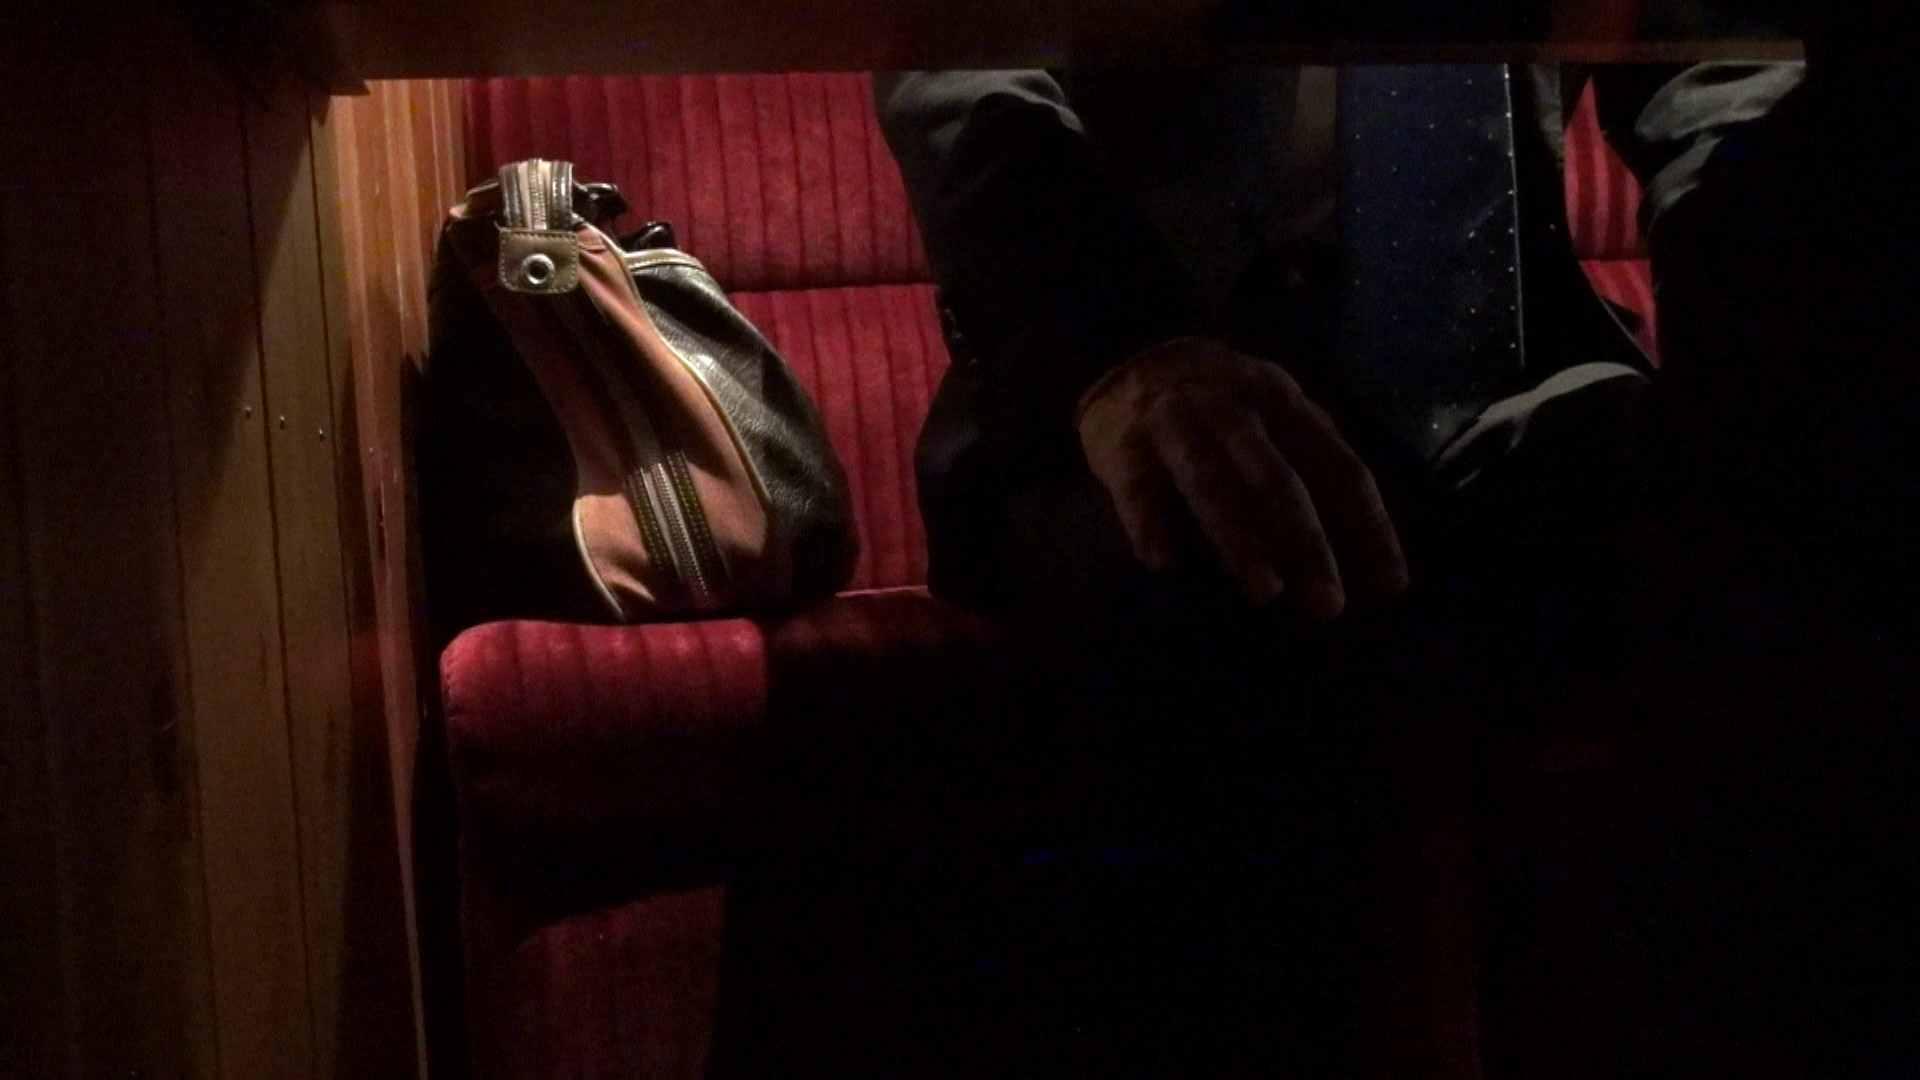 episode1 ヒロトさんと保険外交員との顔合わせ 盗撮特撮 ワレメ動画紹介 13pic 7